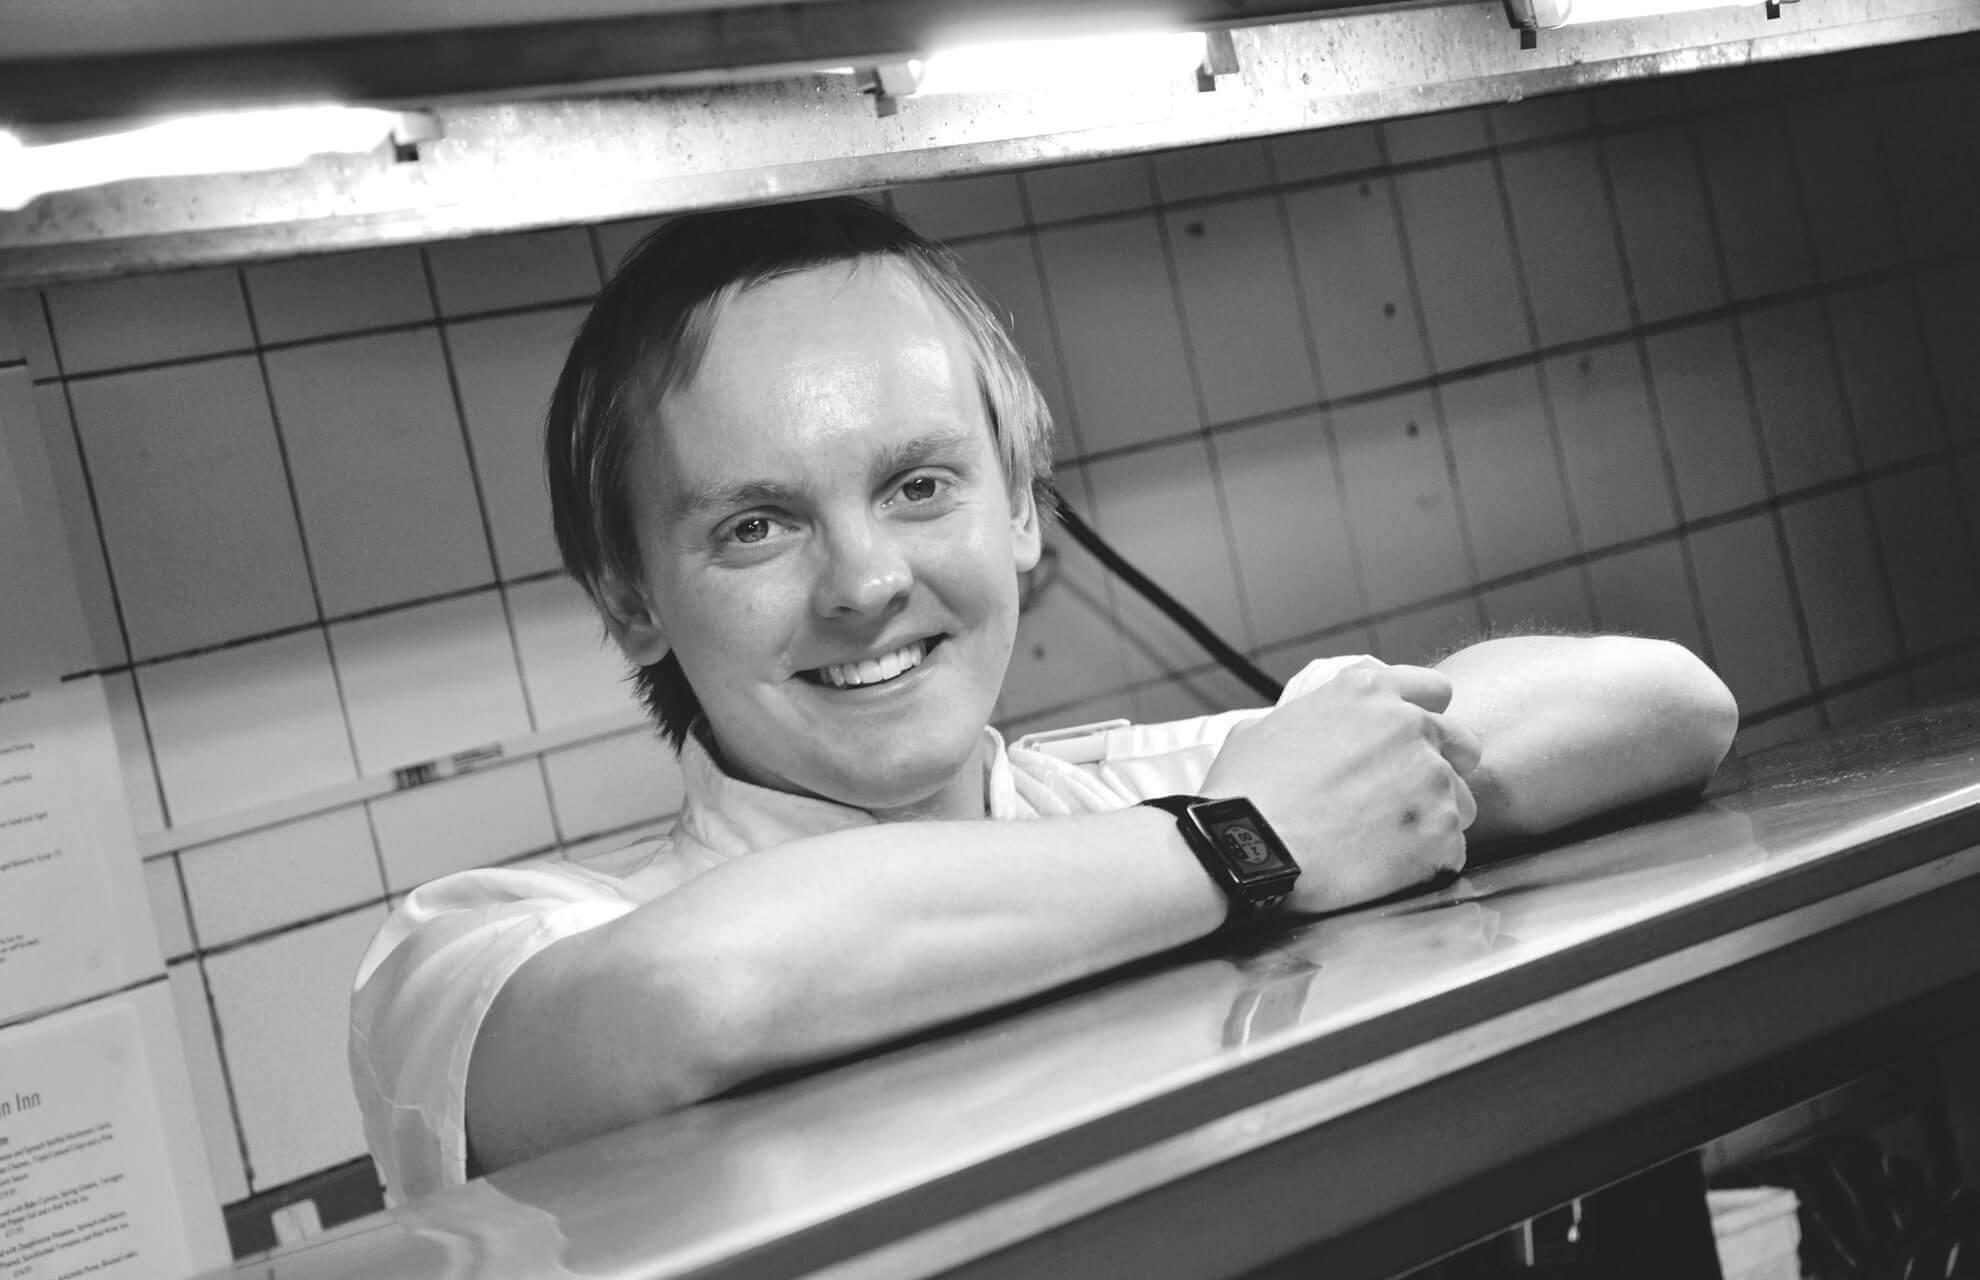 Godron-Stott-Chef-005